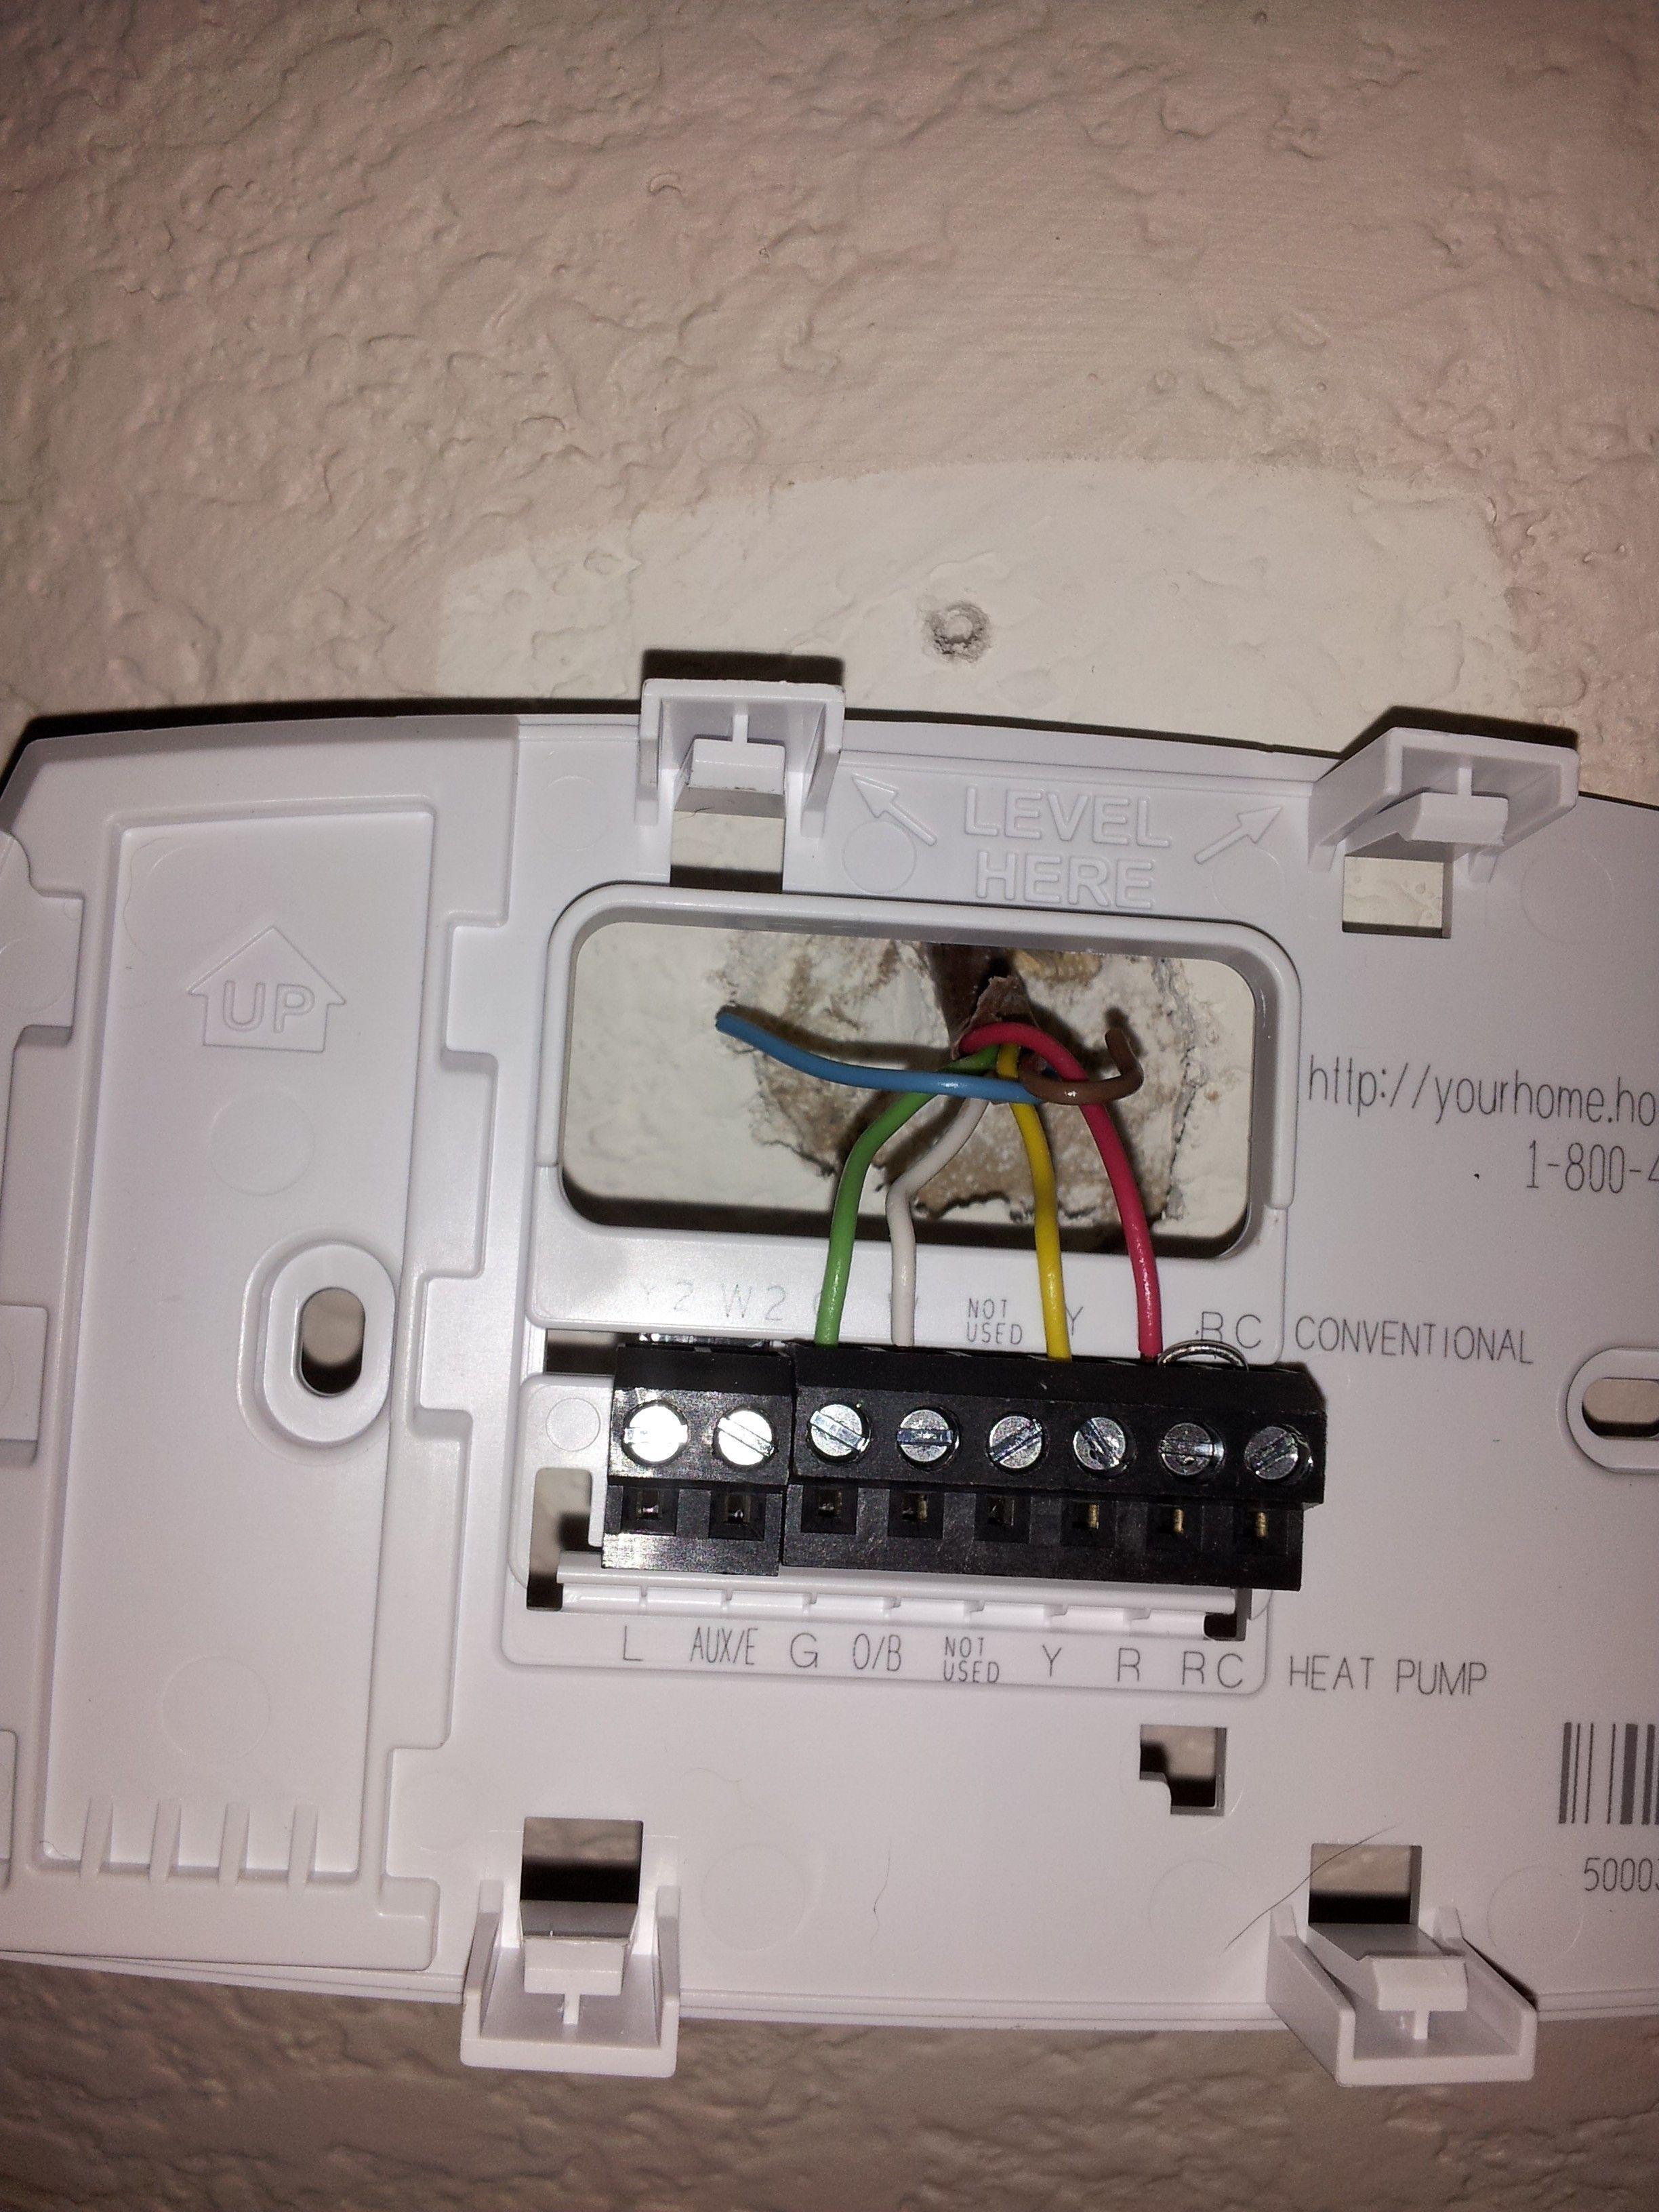 Honeywell Thermostat Wiring Diagram 2 Wire : honeywell, thermostat, wiring, diagram, Inspirational, Honeywell, Rth6350d, Wiring, Diagram, Thermostat, Wiring,, Digital, Thermostat,, Installation